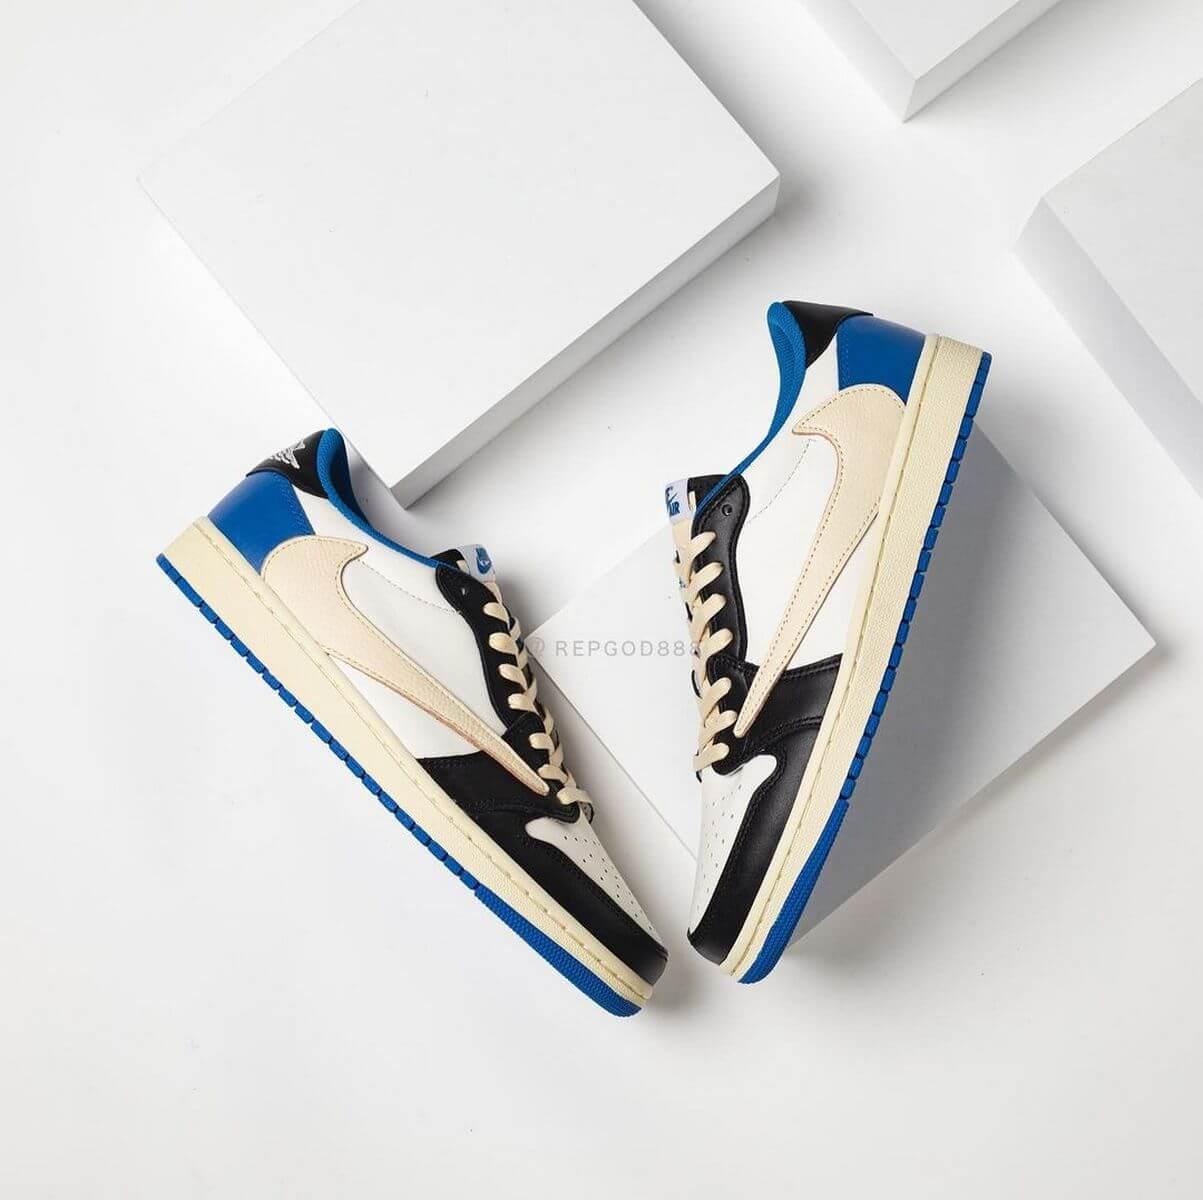 Nike x Travis Scott x Fragment Design - Air Jordan 1 Low - white/black-royal-sail - DM7866-140